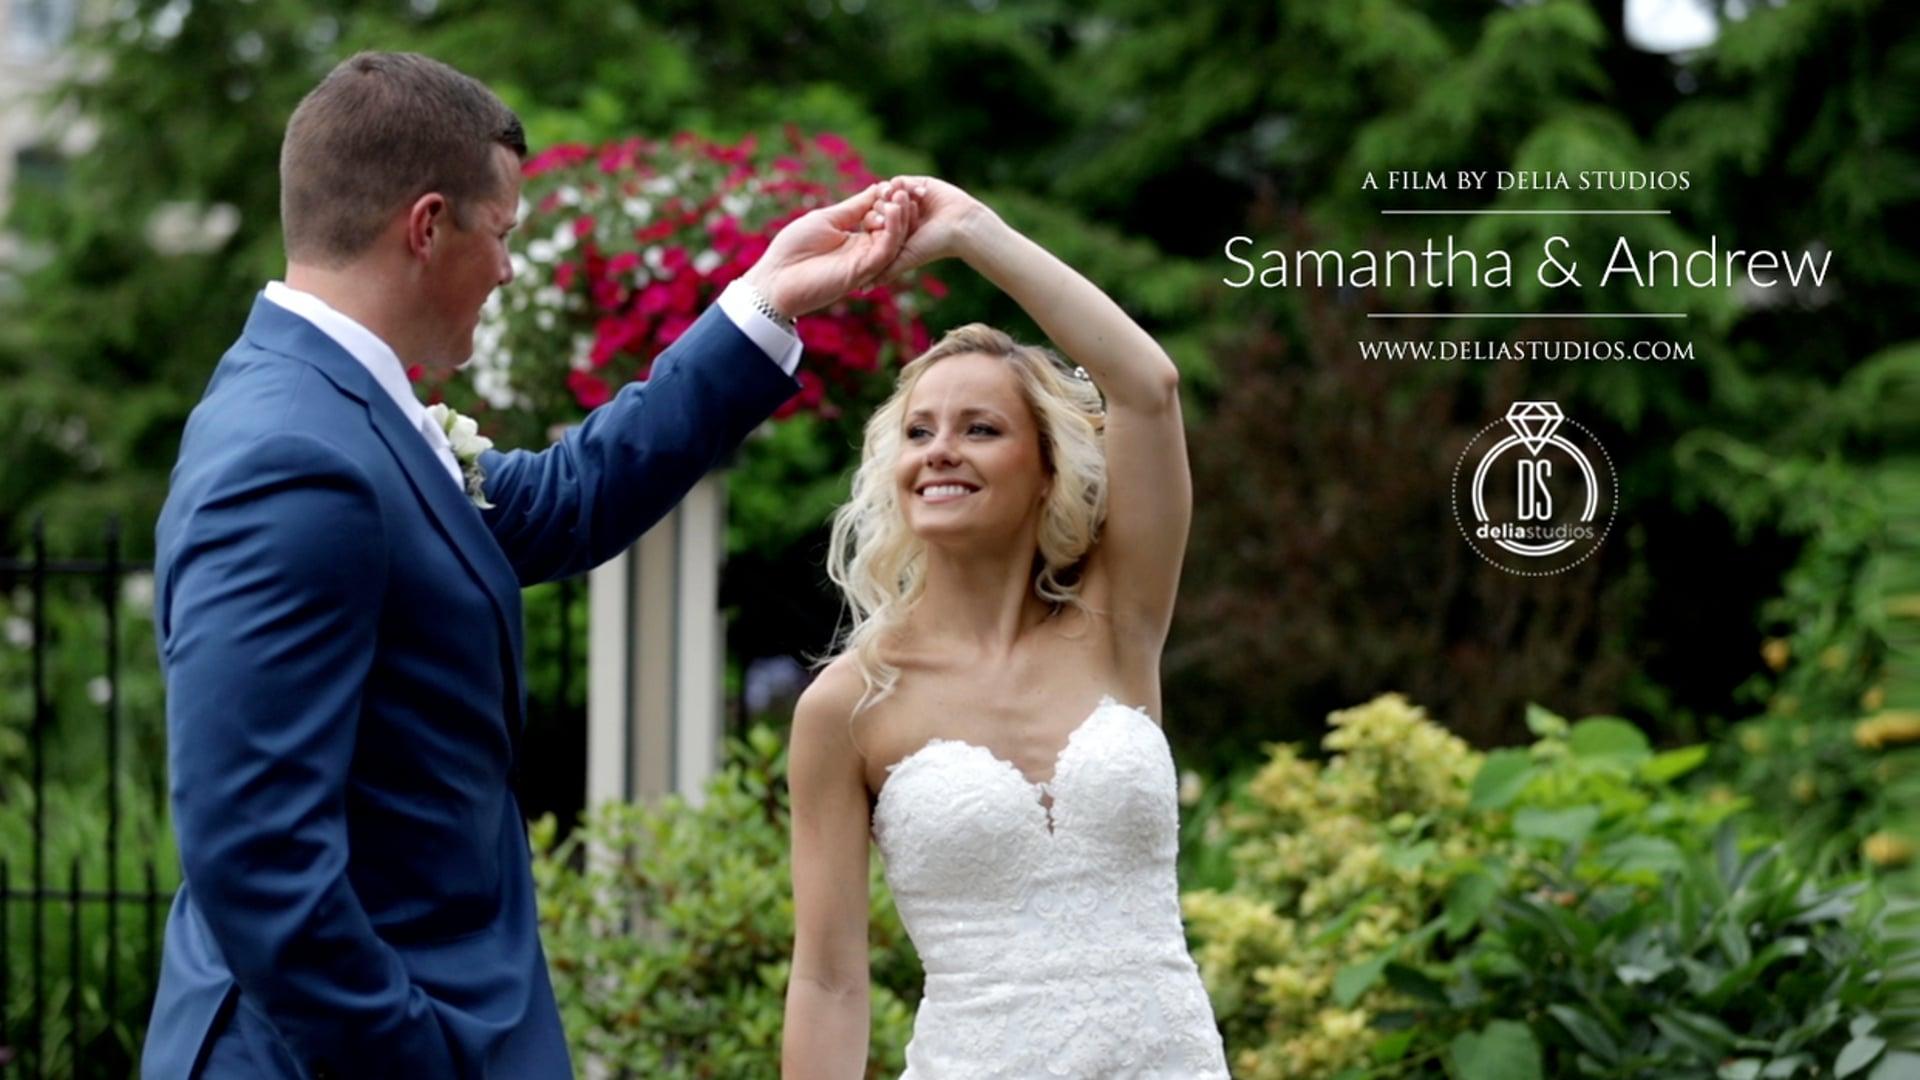 Samantha & Andrew :: Wedding Highlights :: Scotland Run Golf Club, Williamstown, NJ